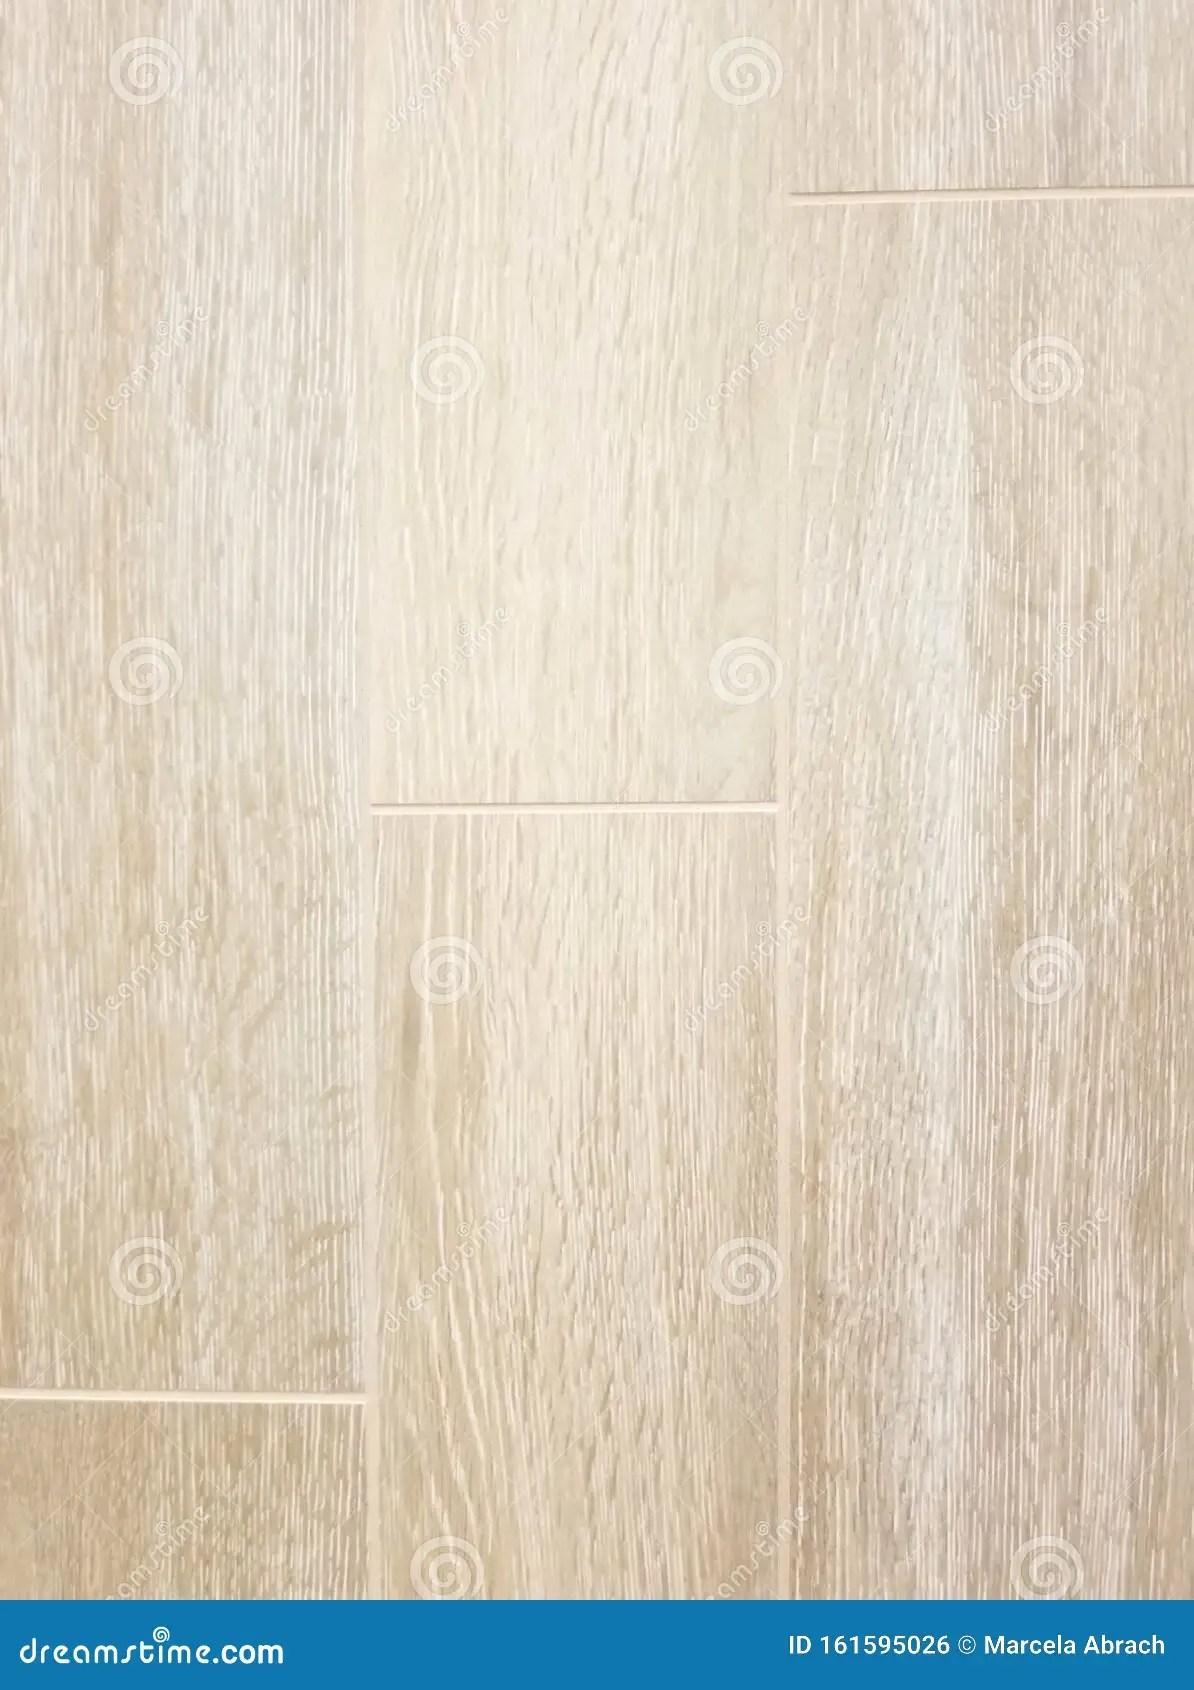 https www dreamstime com texture rectangular tile beige tones simulating wood grain ceramic porcelain visible light colored grout tiles image161595026